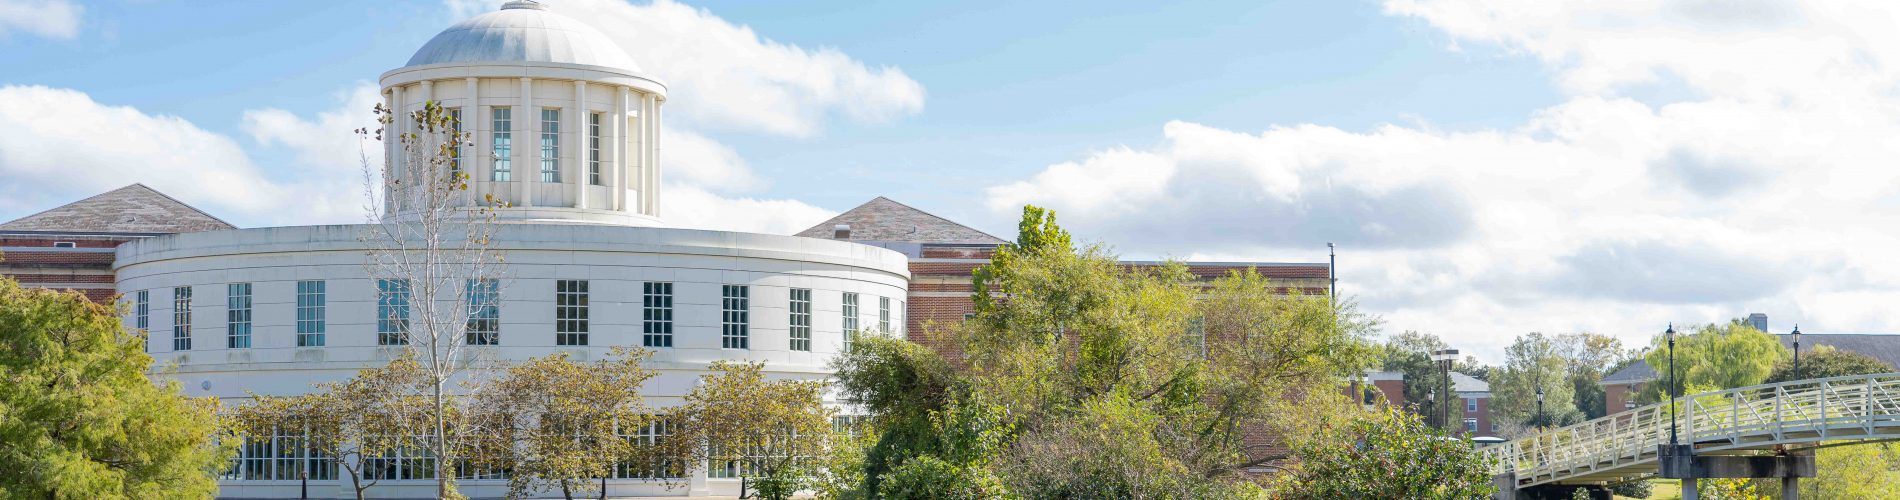 Photo of the University of Maryland Eastern Shore